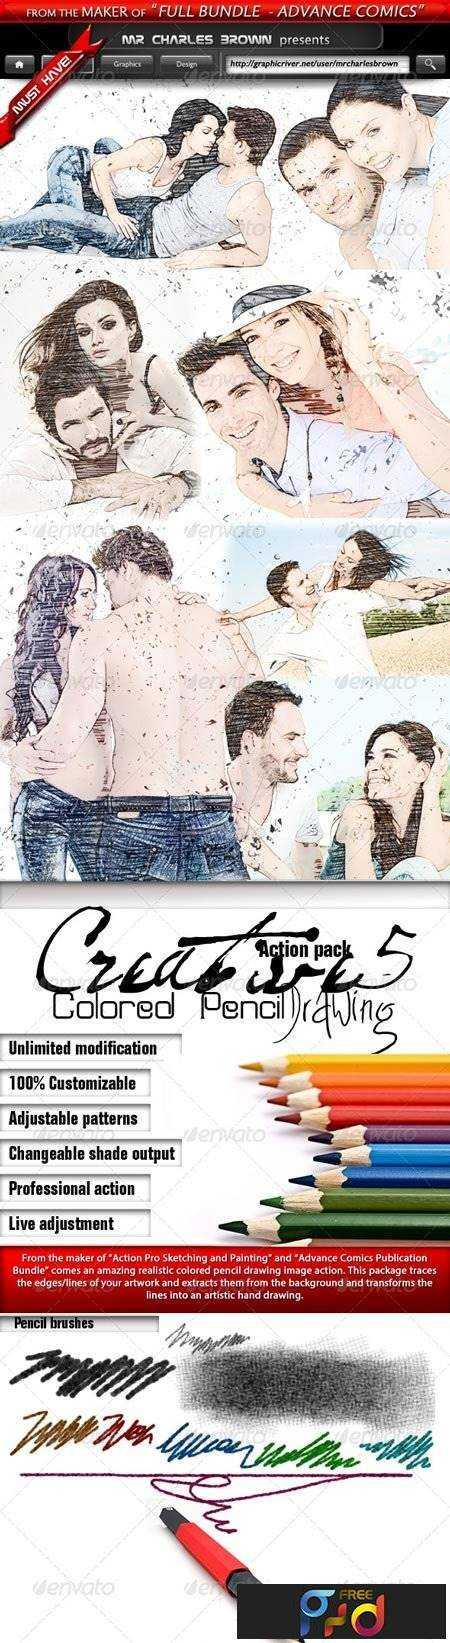 FreePsdVn.com_1702098_PHOTOSHOP_creative_colored_pencil_drawing_5_5438806